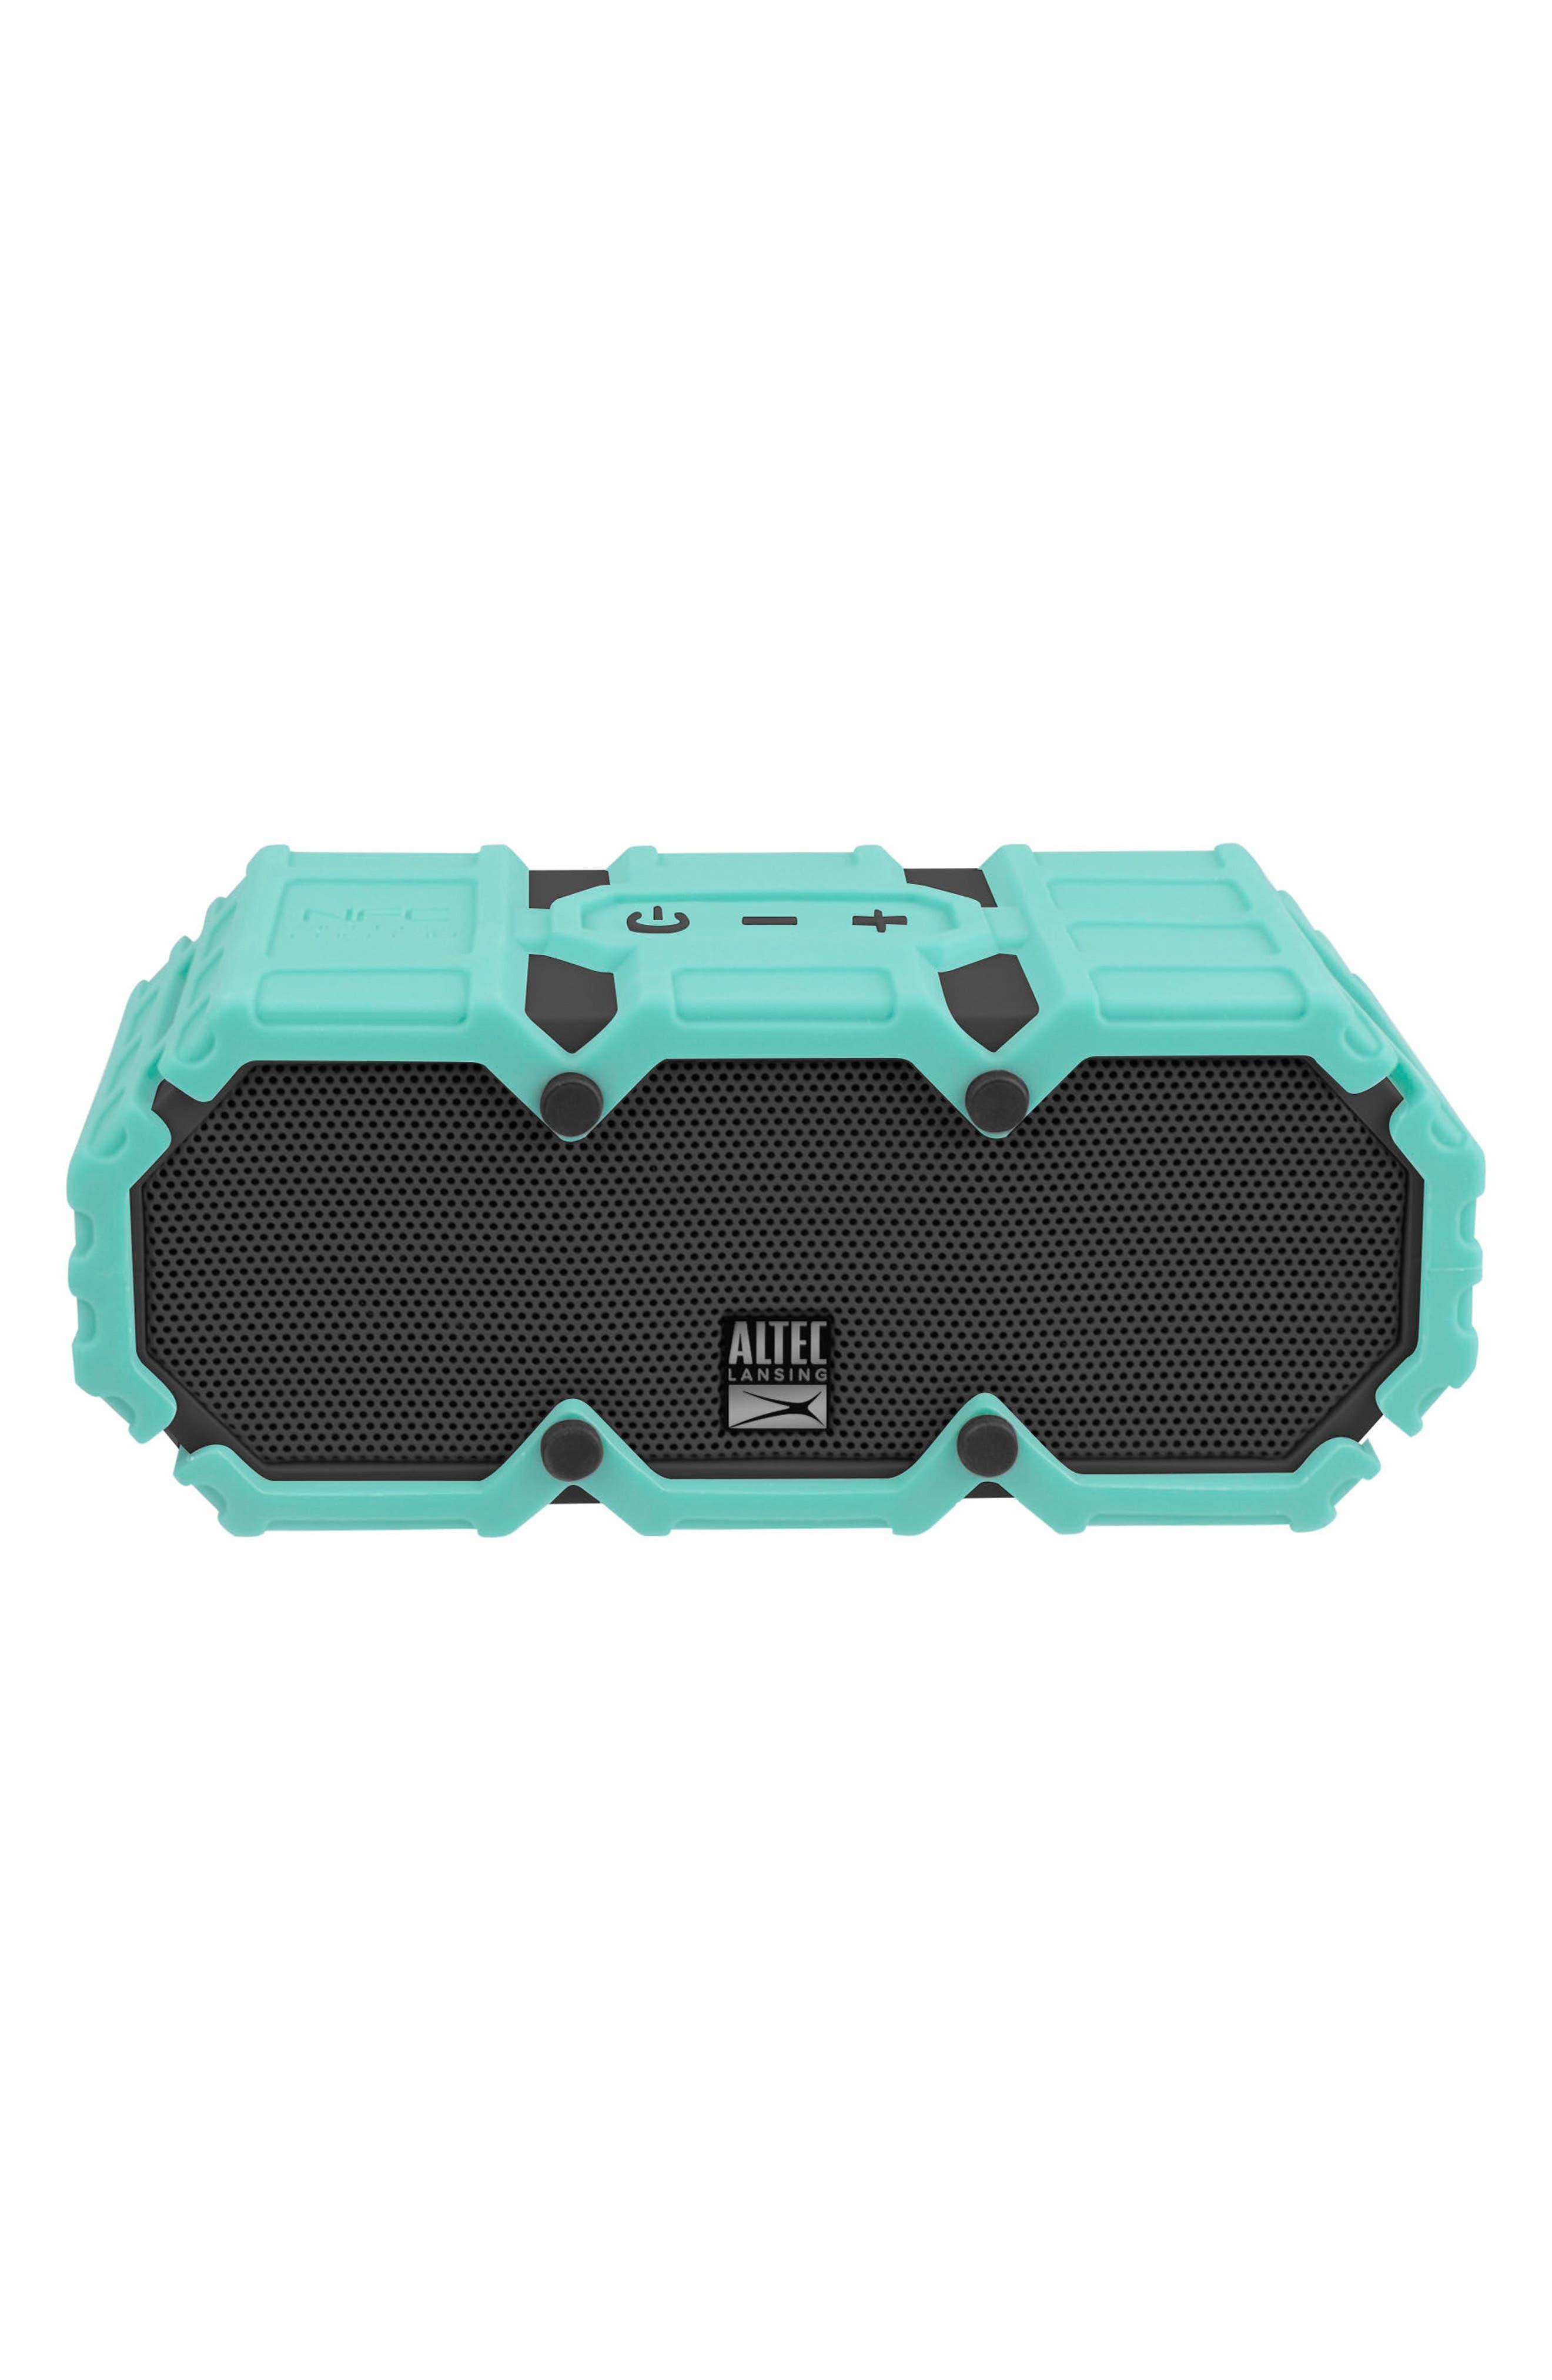 Mini Lifejacket S3 Waterproof Wireless Speaker,                         Main,                         color, MINT GREEN/ DARK GREY